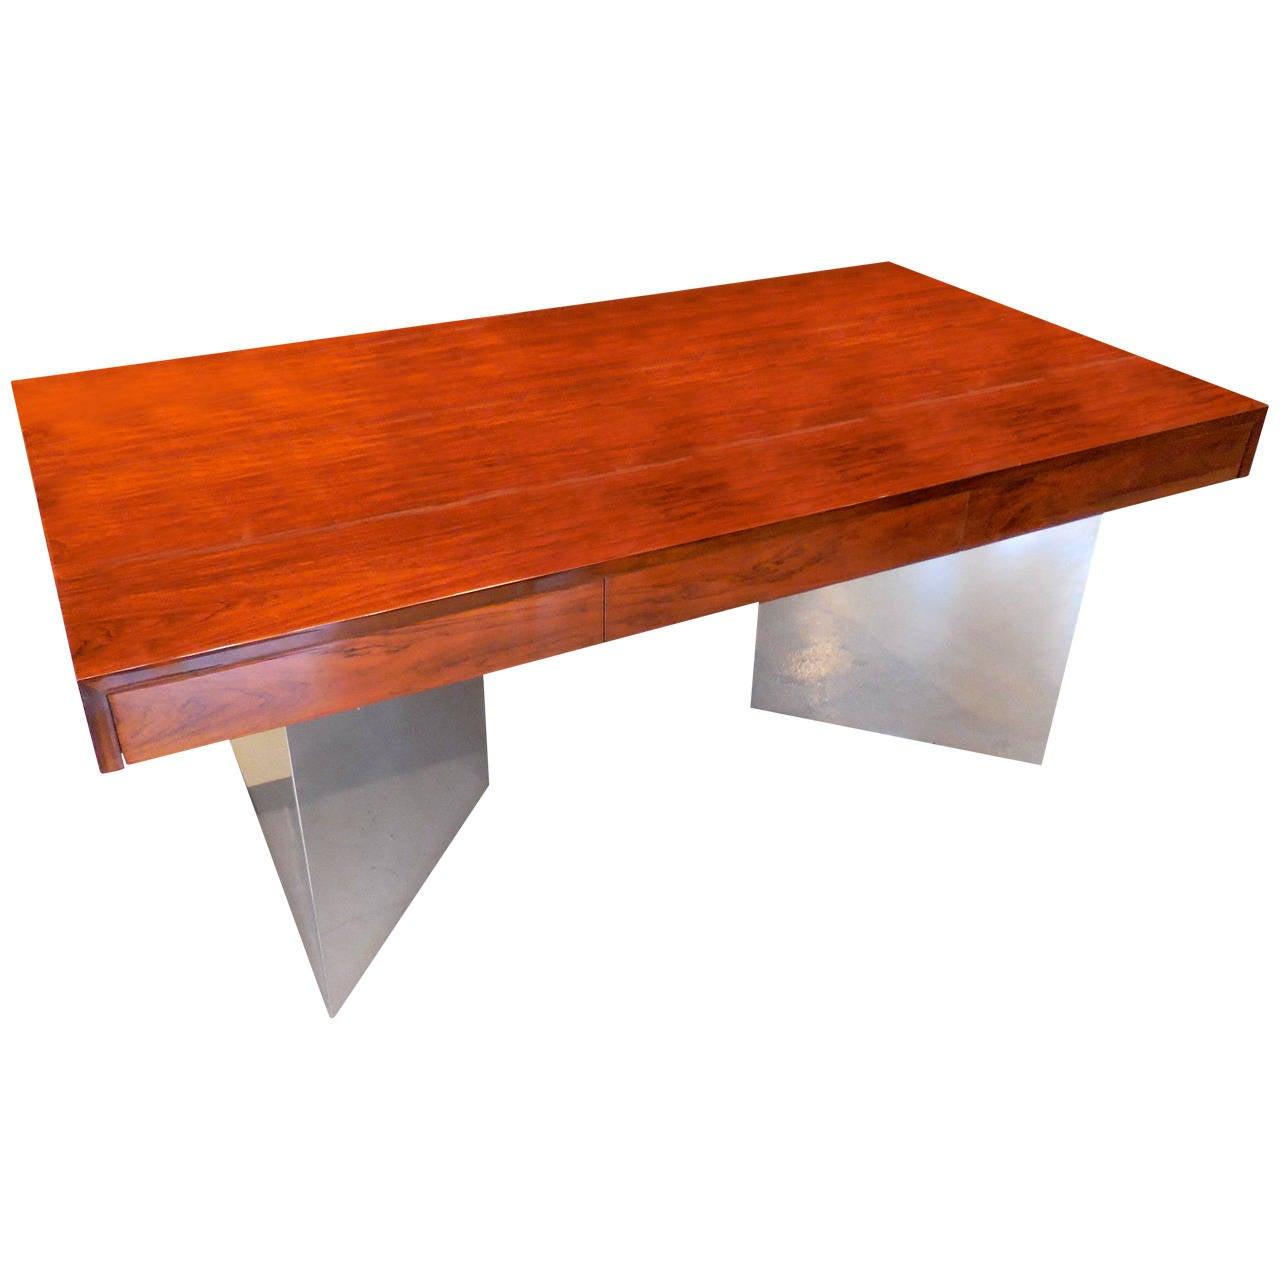 extraordinary executive office desk | Rare and Extraordinary Rosewood Executive Desk by Pace ...